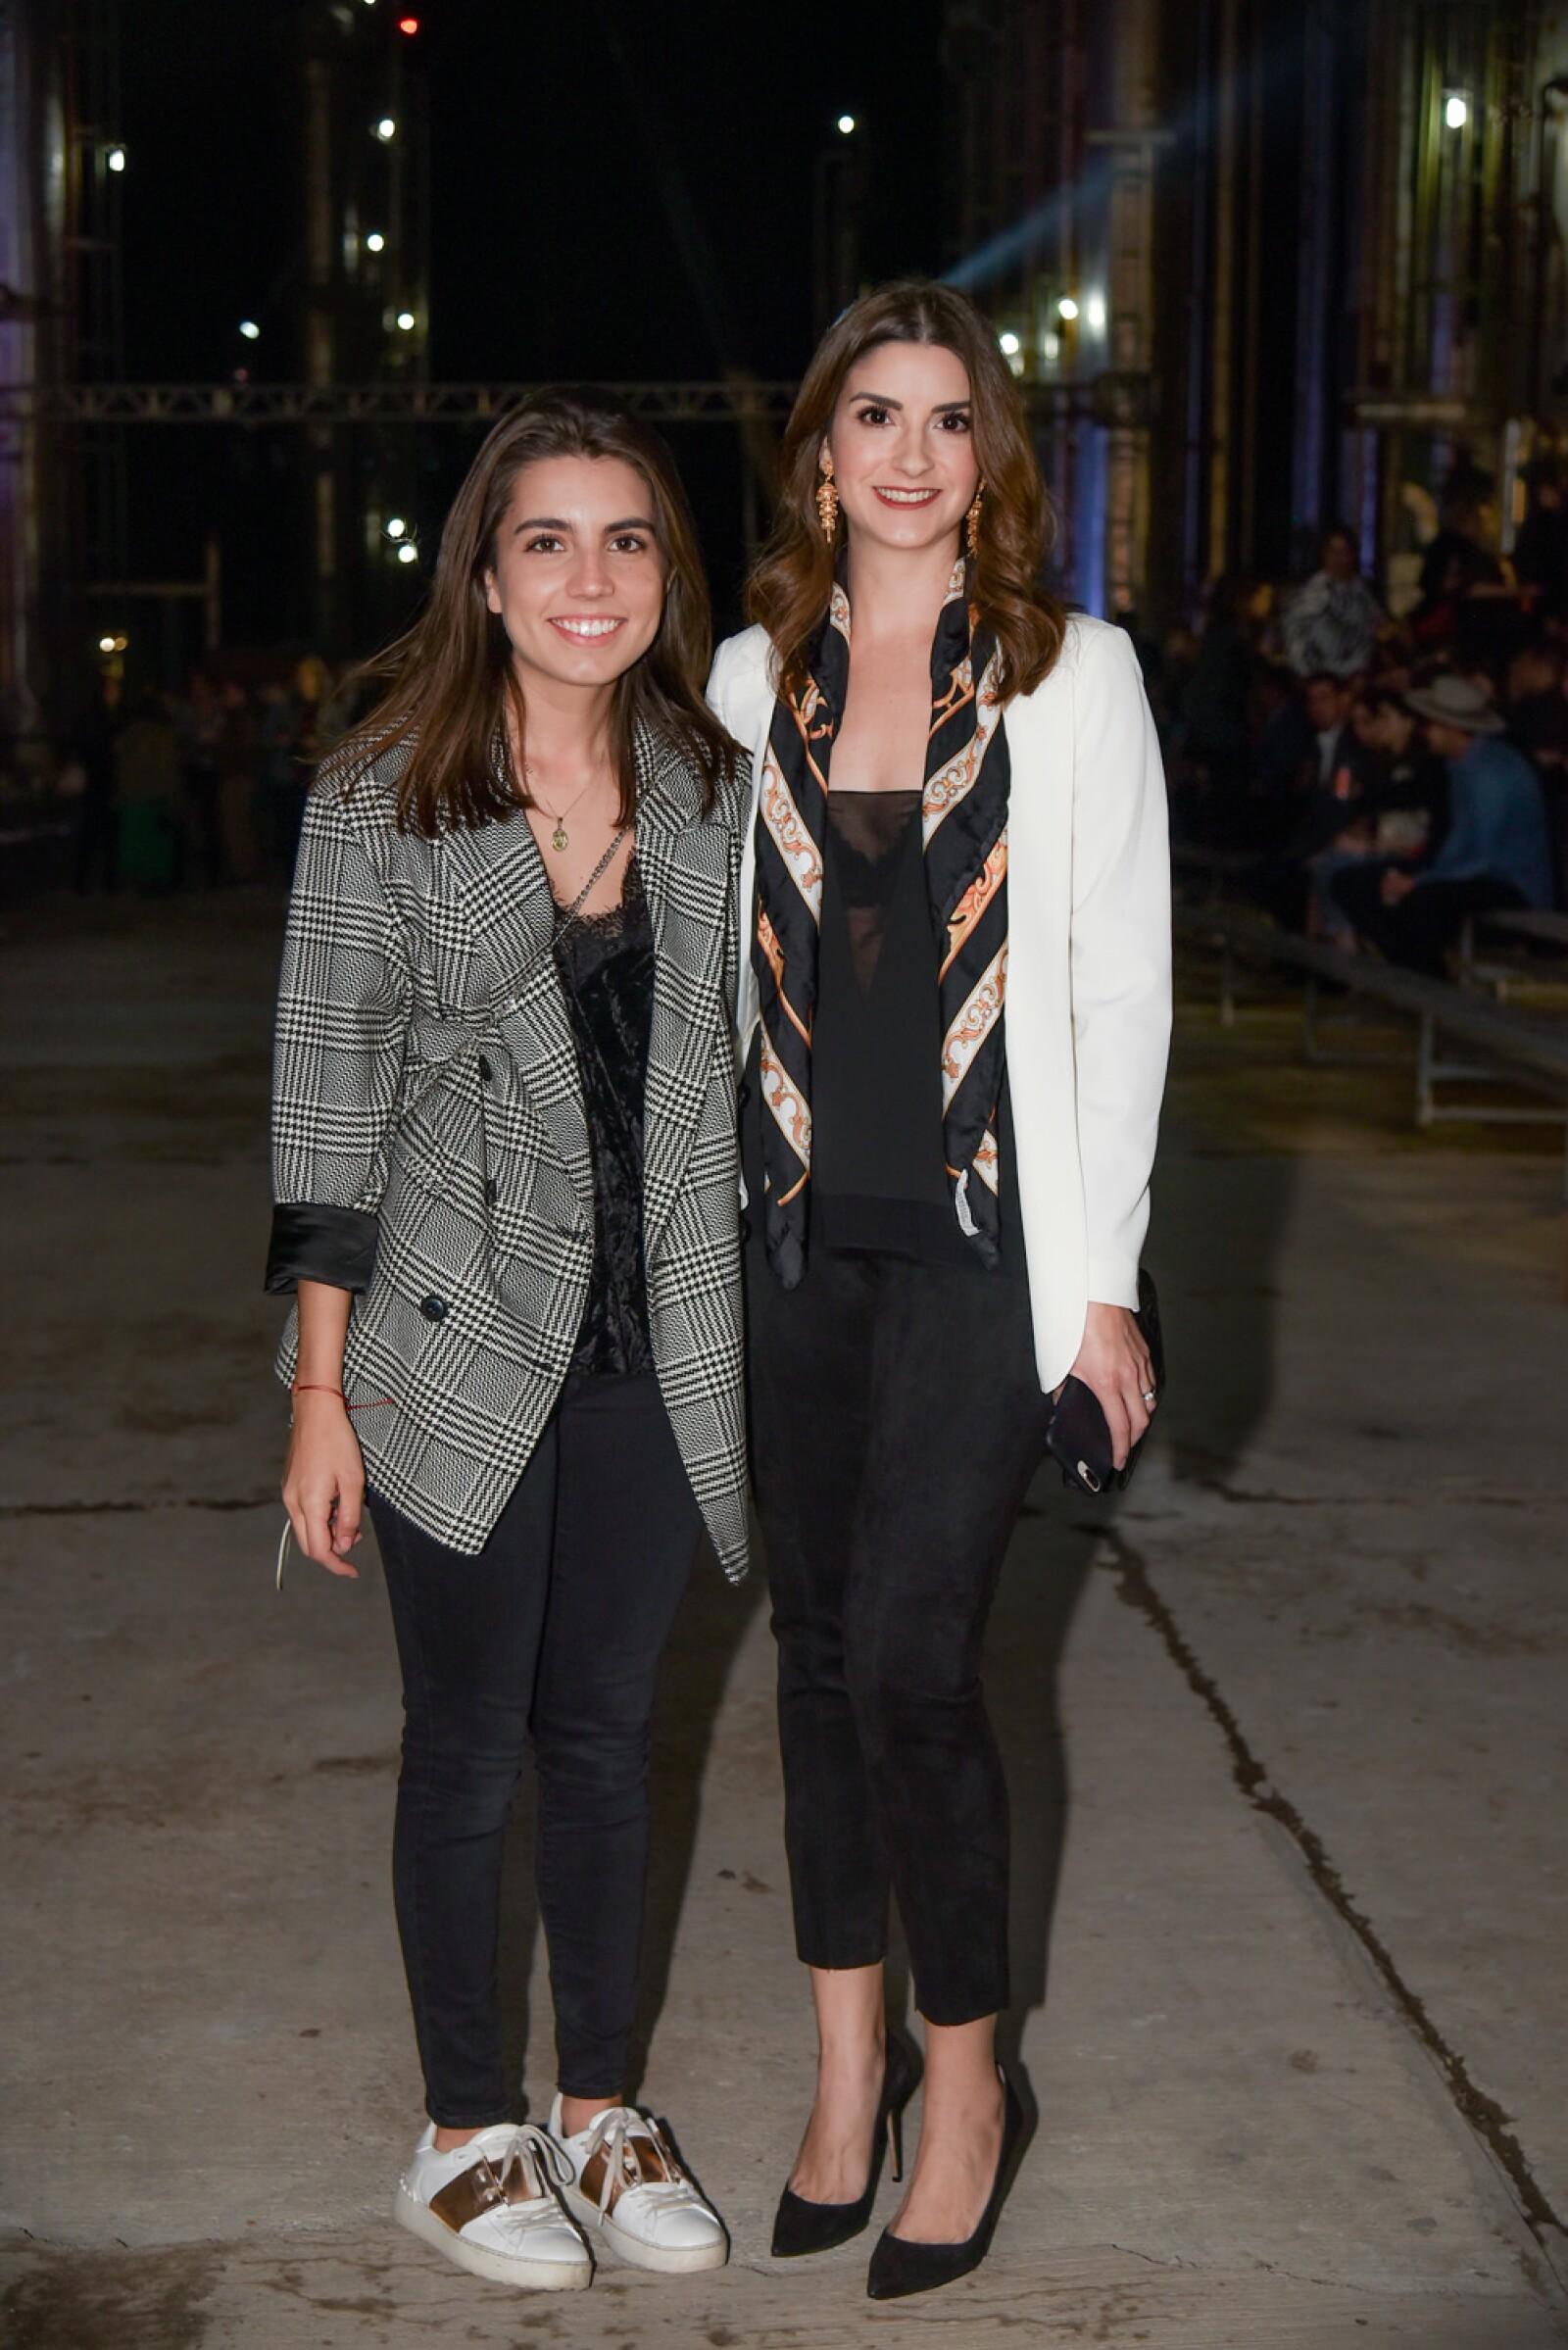 Ana Gabriela Zotelo y Maria Sentini.jpg